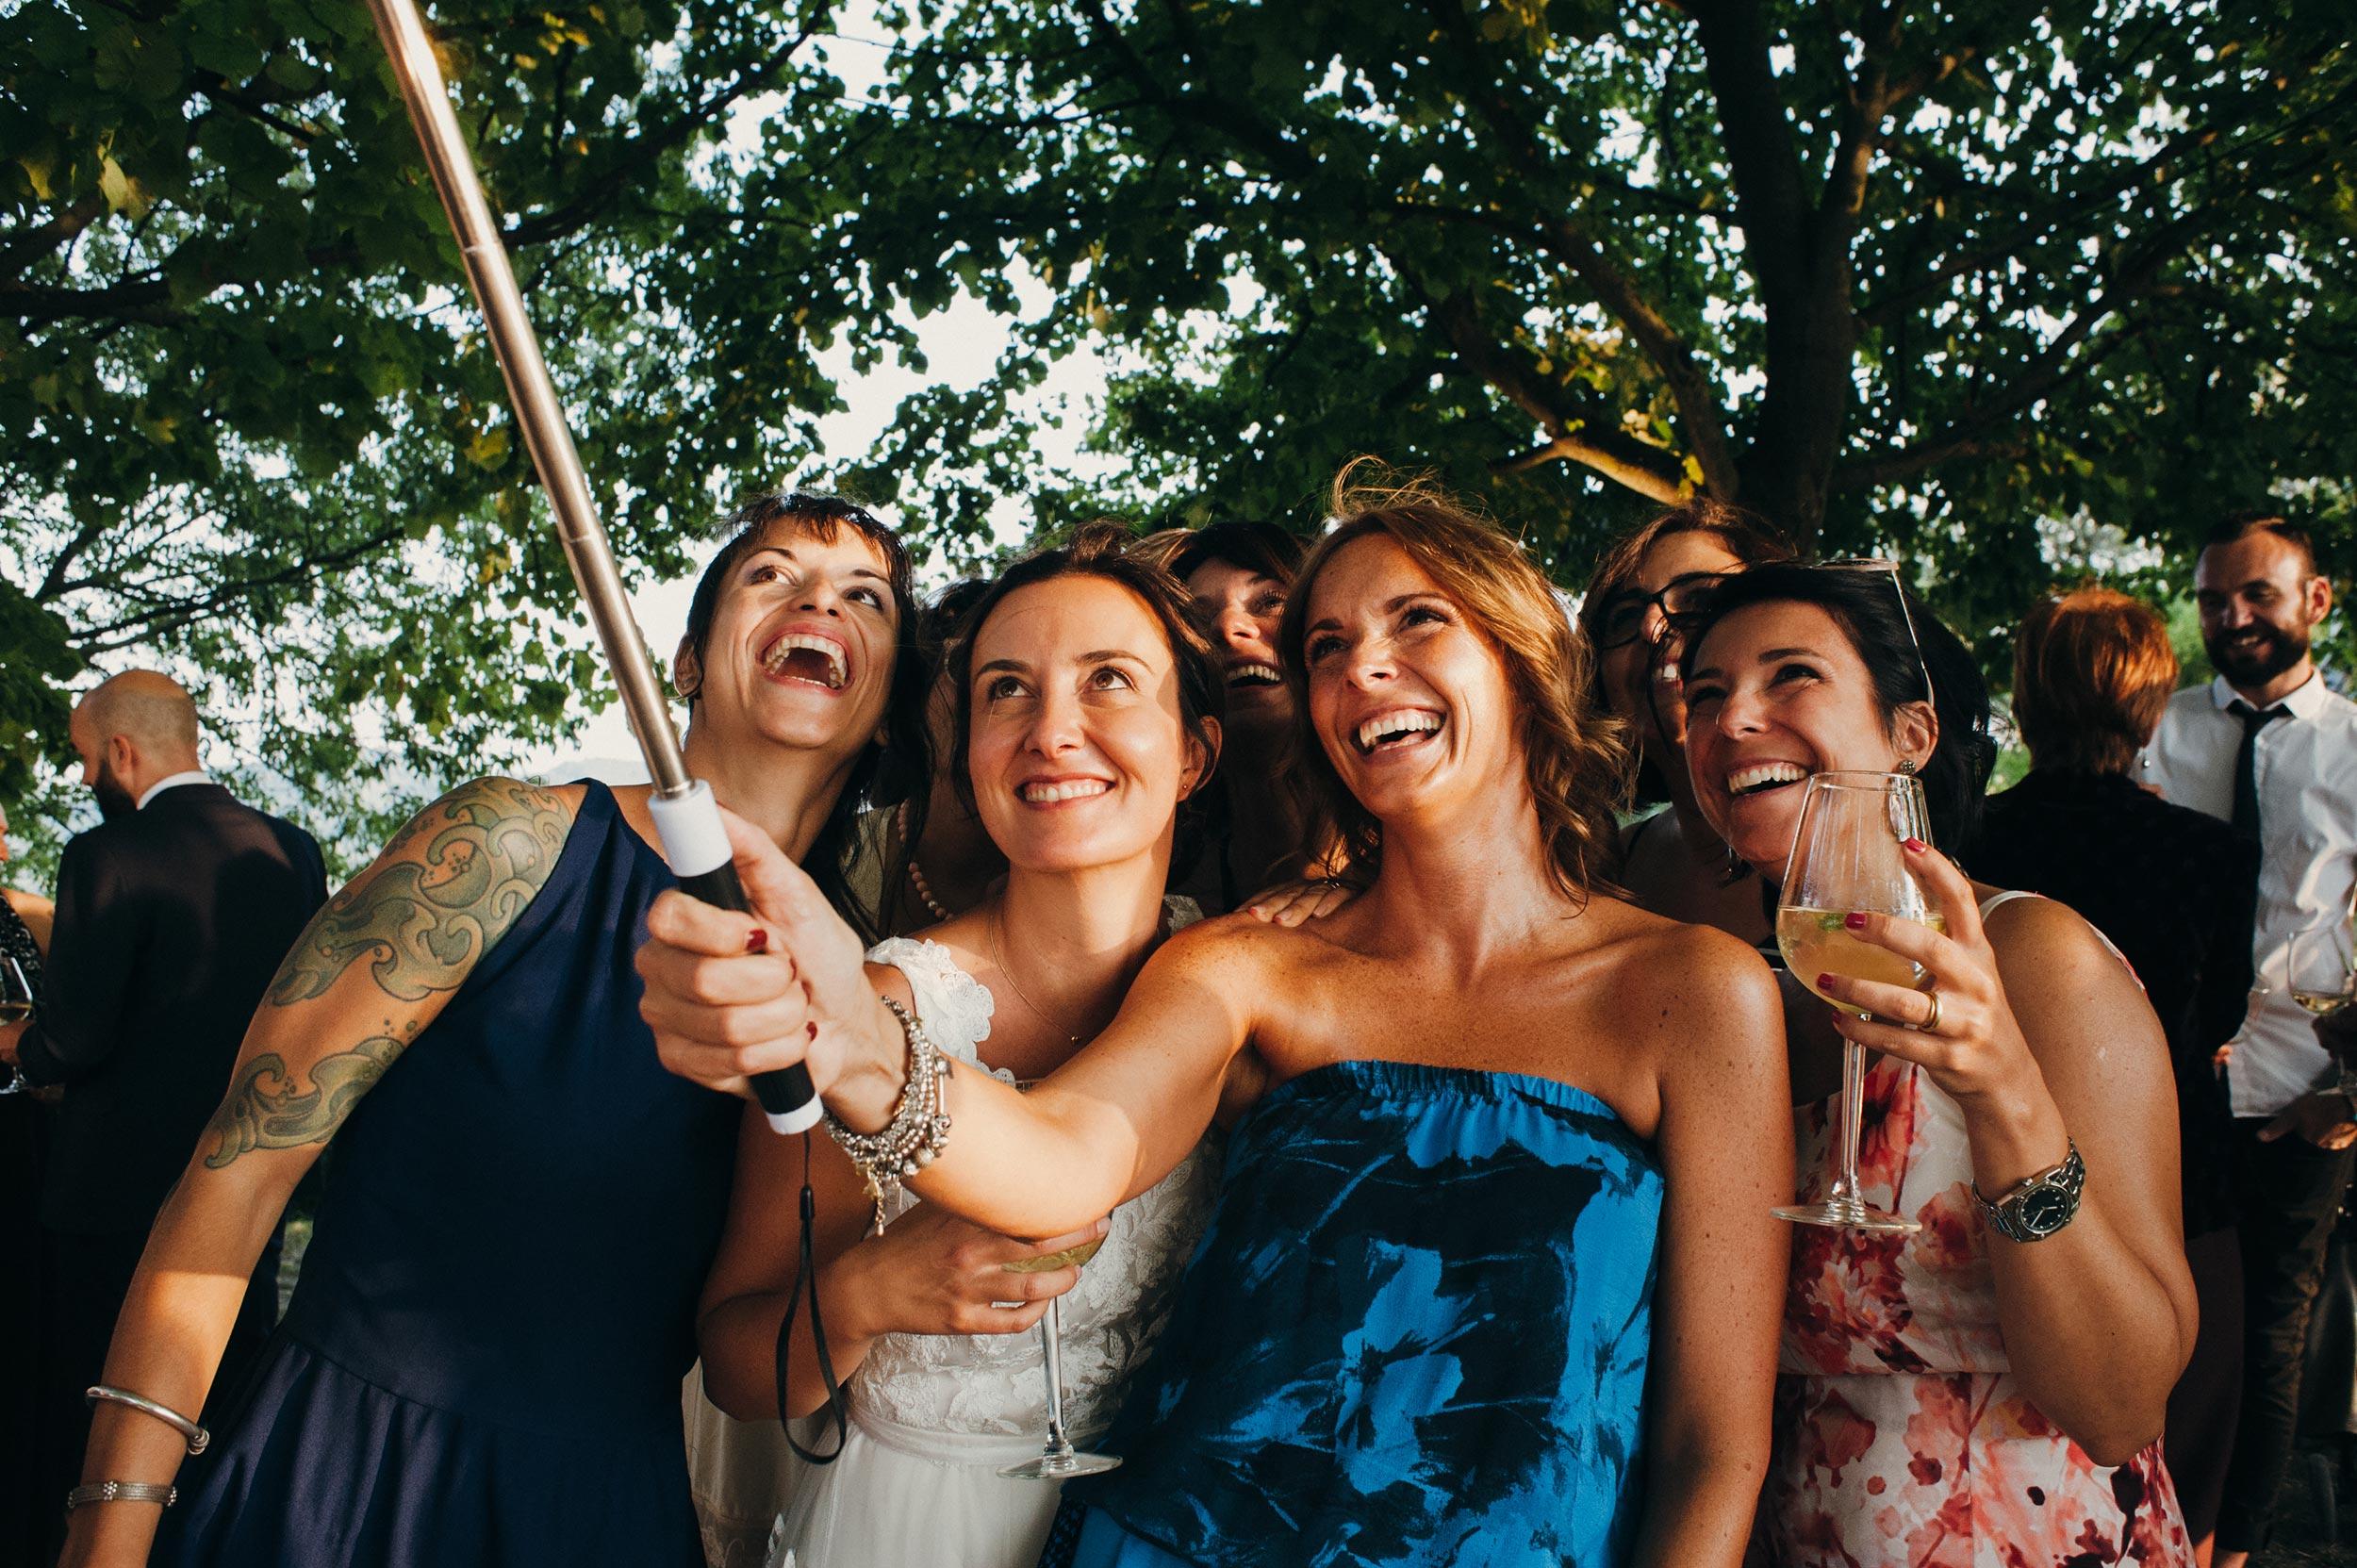 2016-Davor-Chiara-Monferrato-Asti-Vercelli-Wedding-Photographer-Italy-Alessandro-Avenali-55.jpg